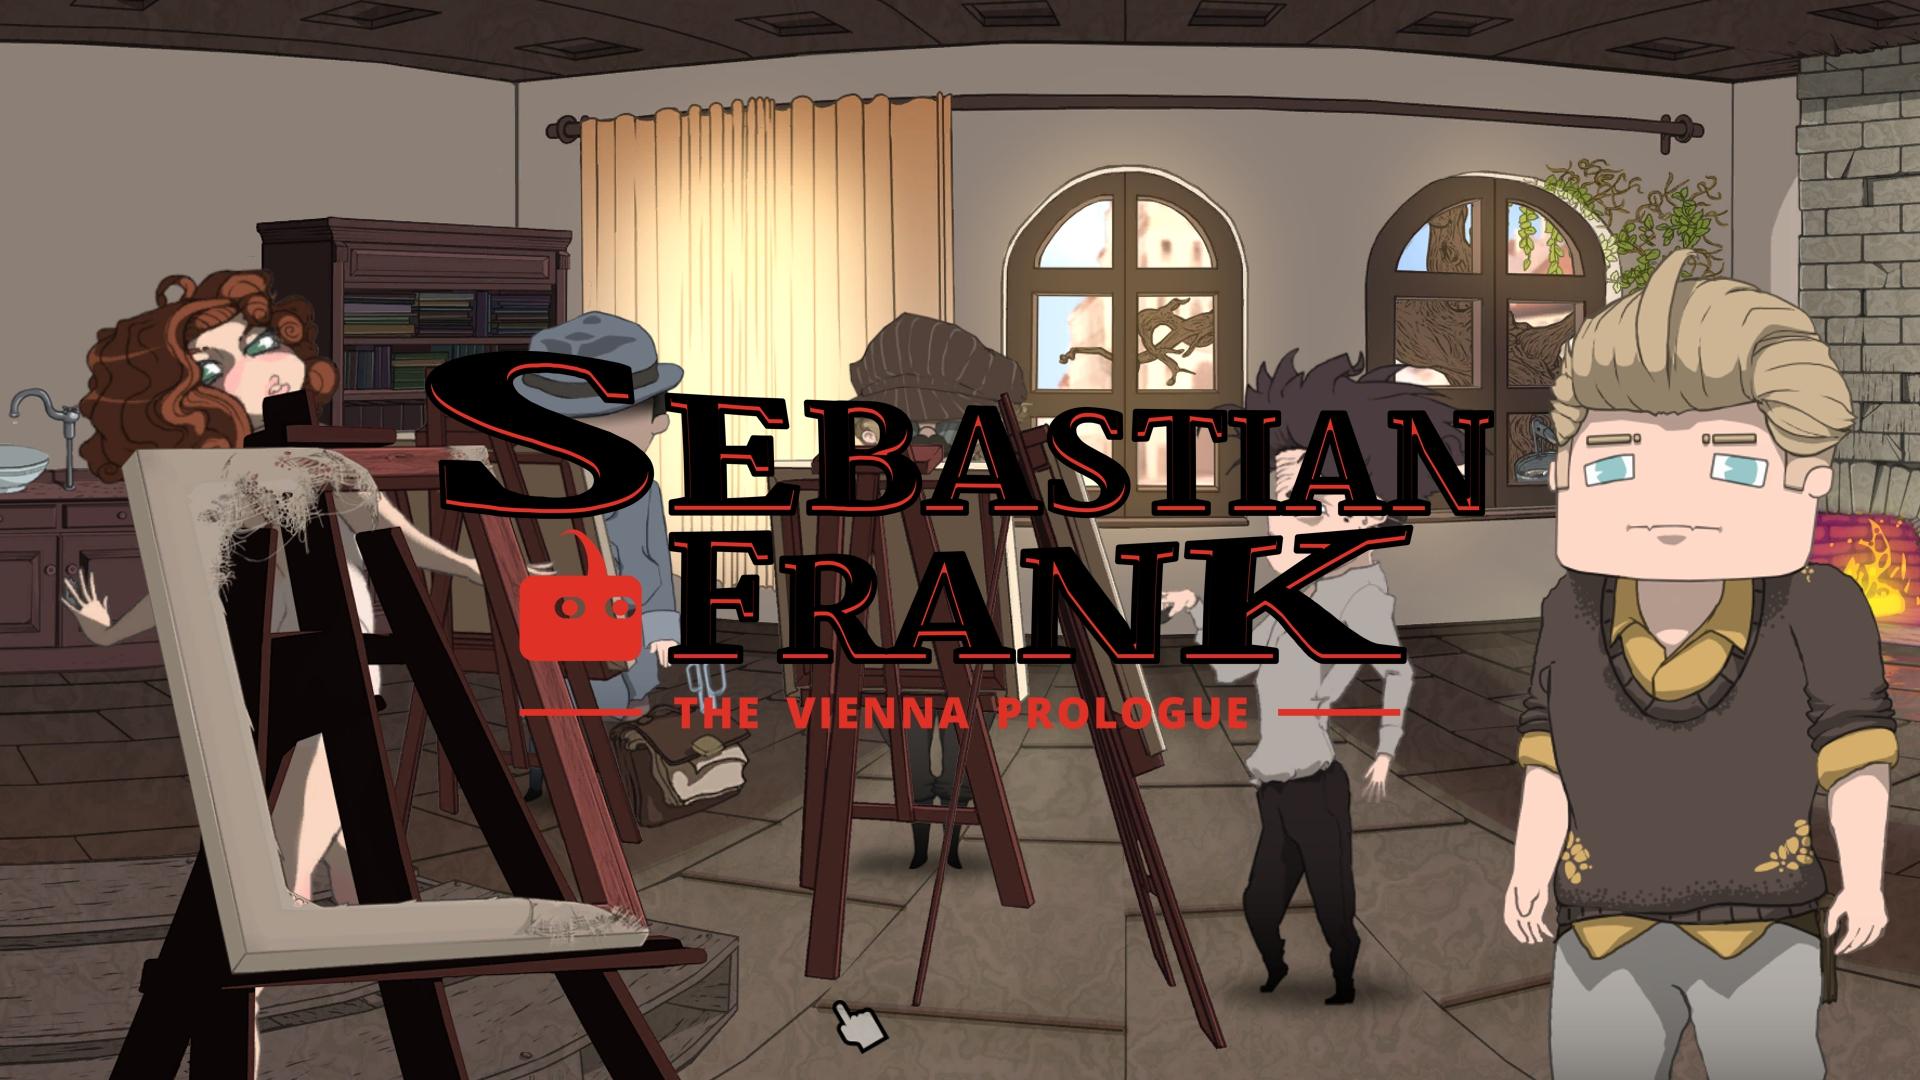 Sebastian Frank - The Vienna Prologue